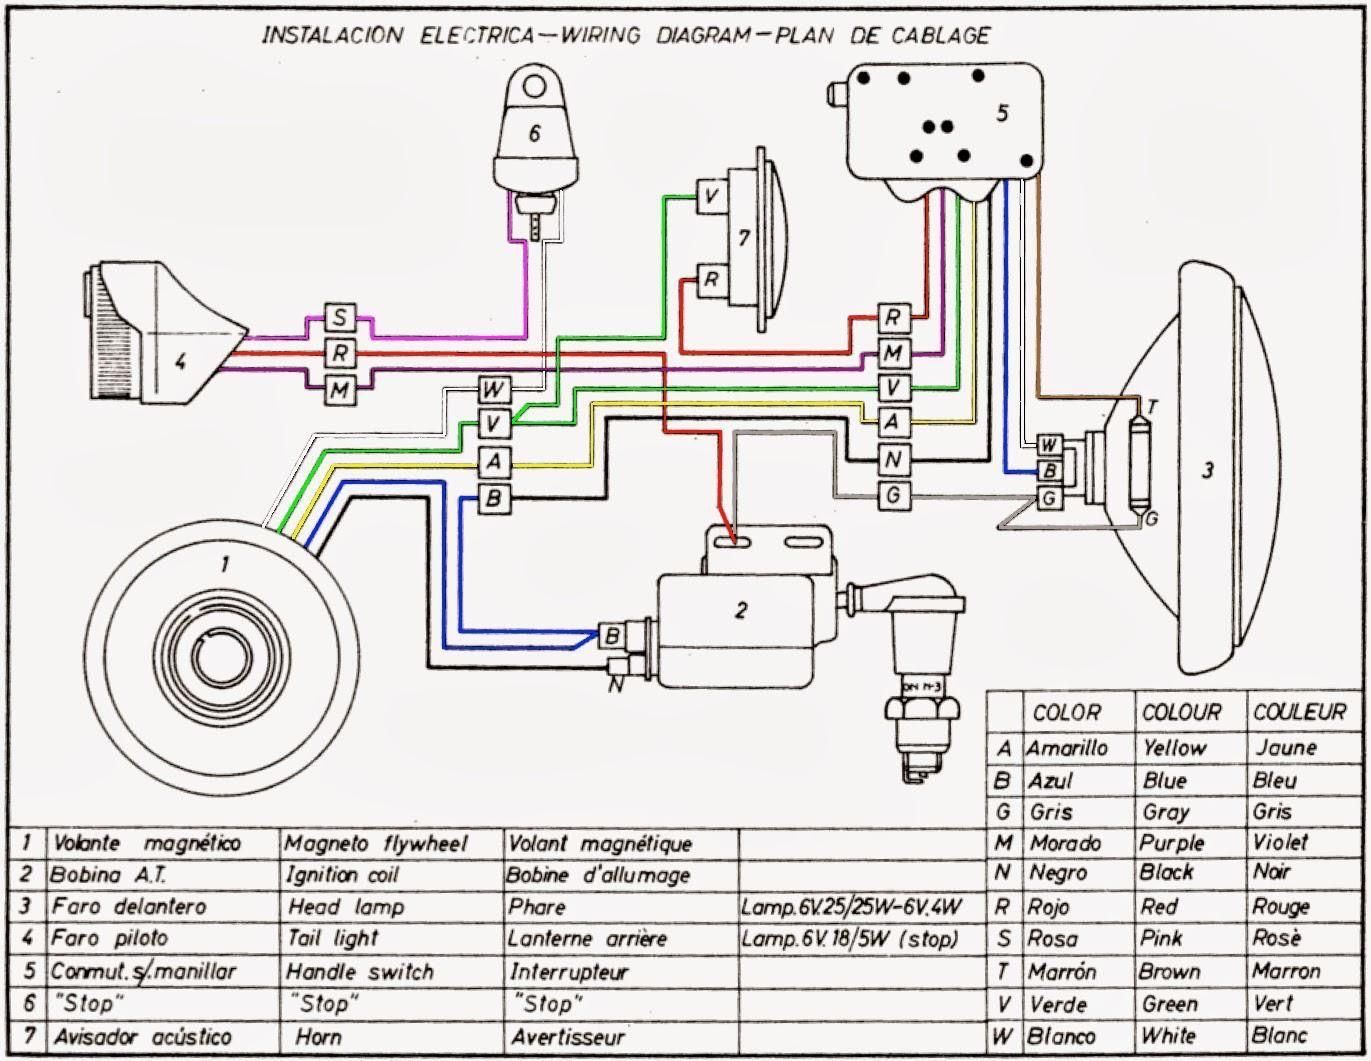 medium resolution of puch wiring diagram wiring diagrampuch wiring diagrams for motorcycles z3 wiring library diagrambultaco wiring diagram wiring